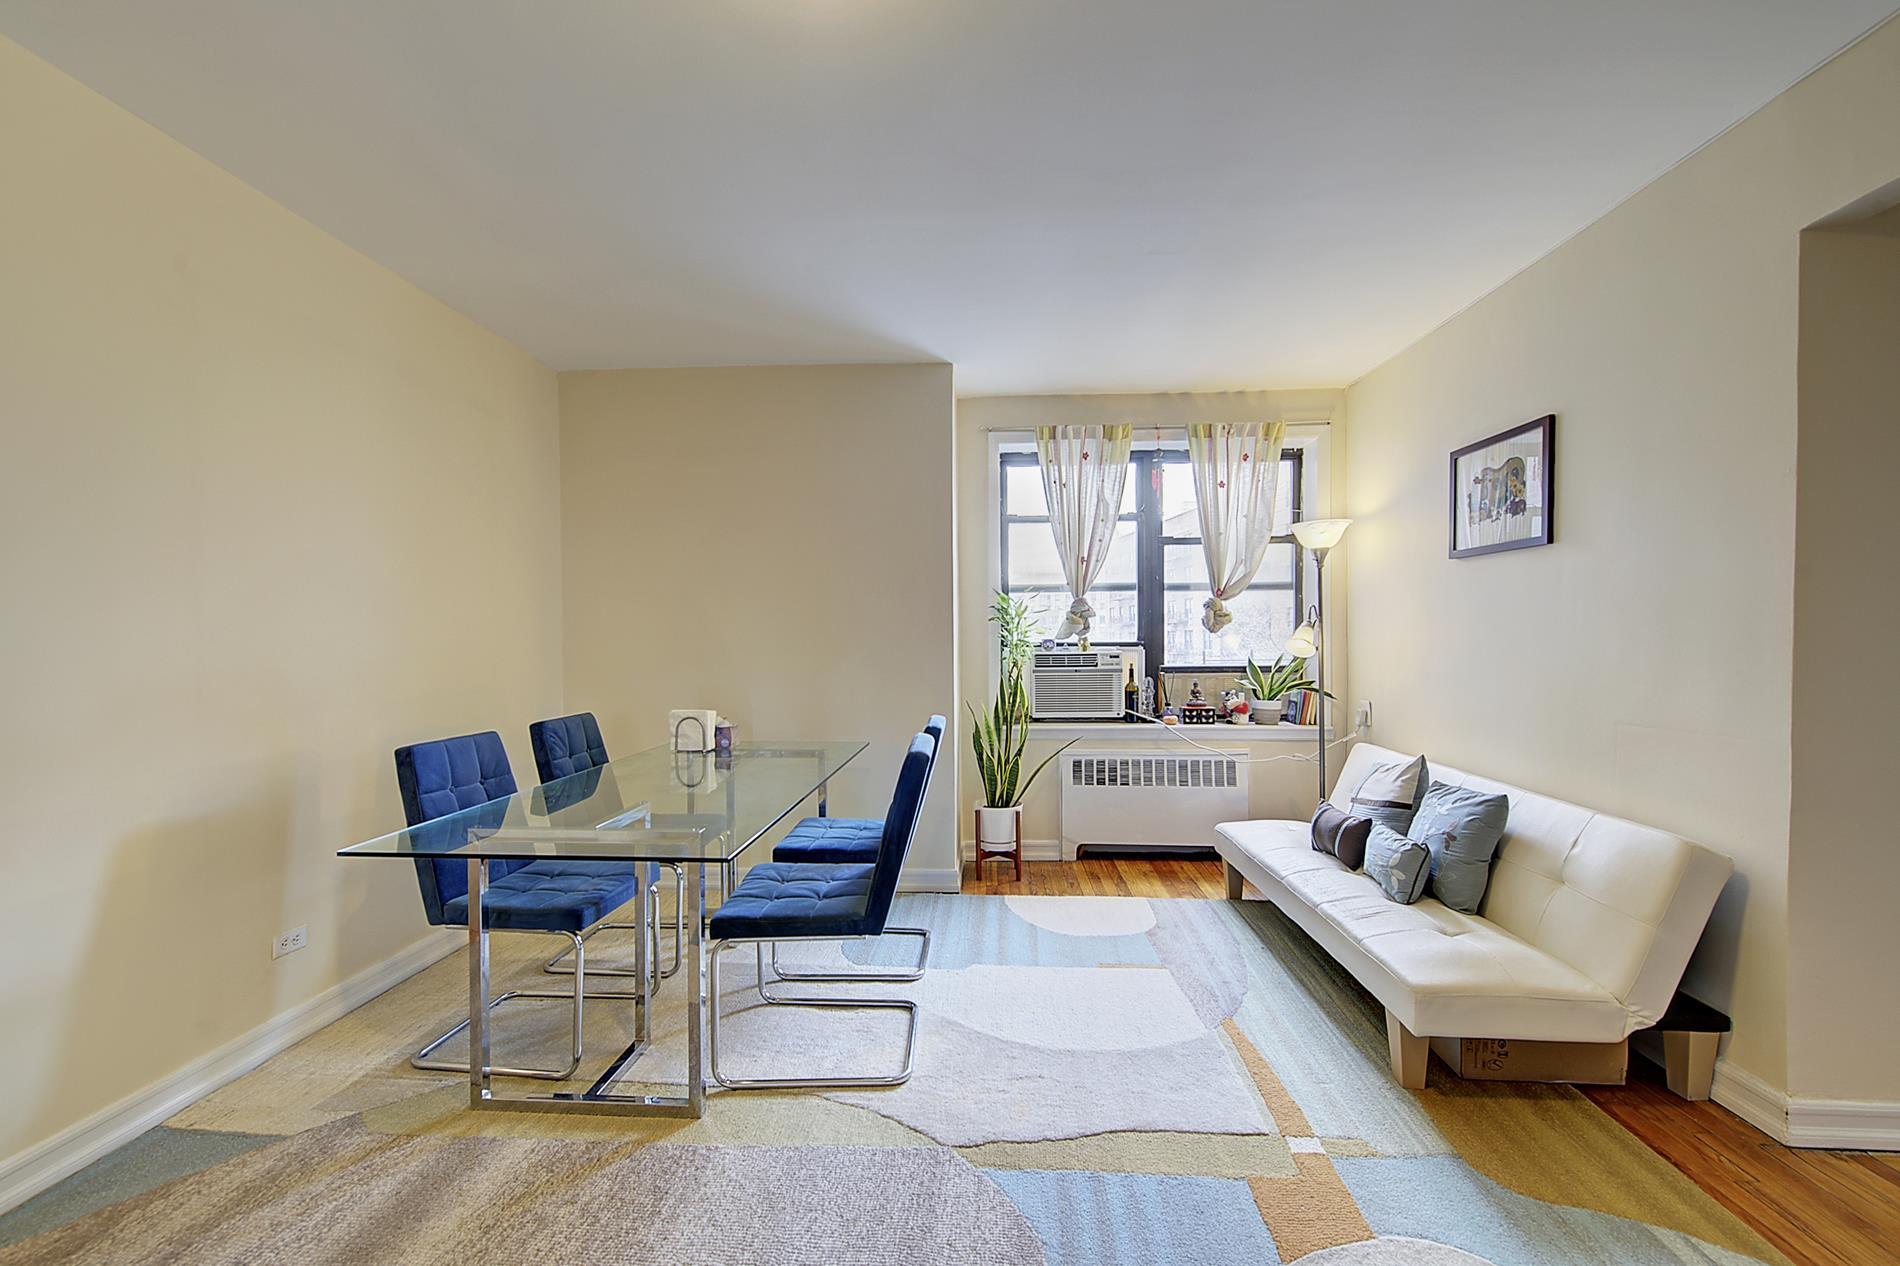 Apartment for sale at 44-05 Macnish Street, Apt 3-C